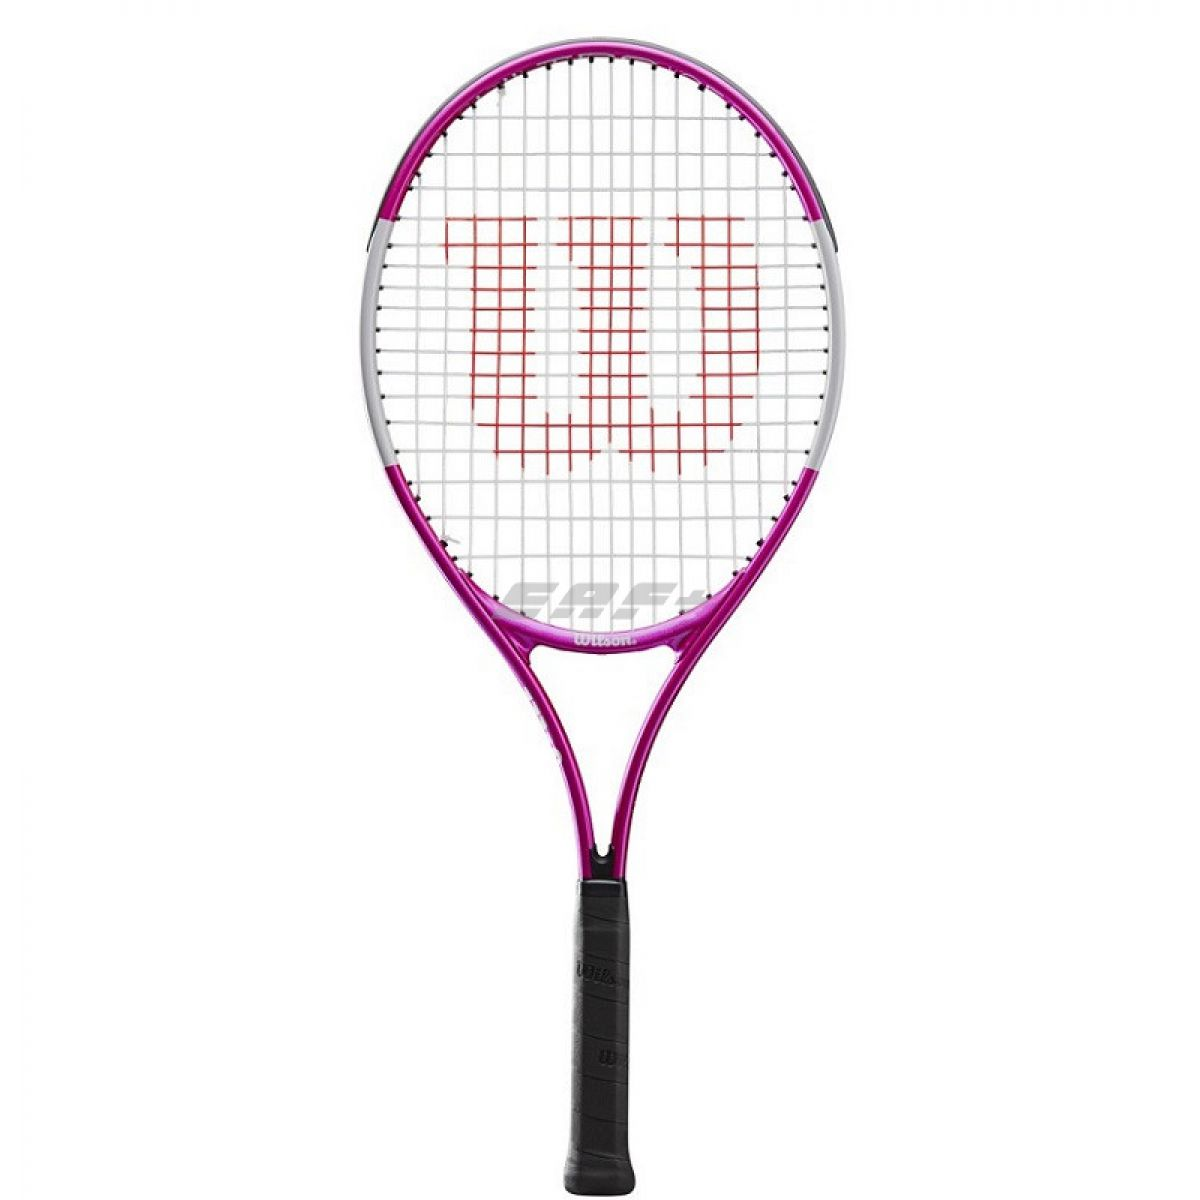 Ракетка теннисная Ракетка б/т Wilson Ultra Pink23 GR0000, арт.WR027910U, для 7-8 лет, алюминий,со струн,роз-бел-черн